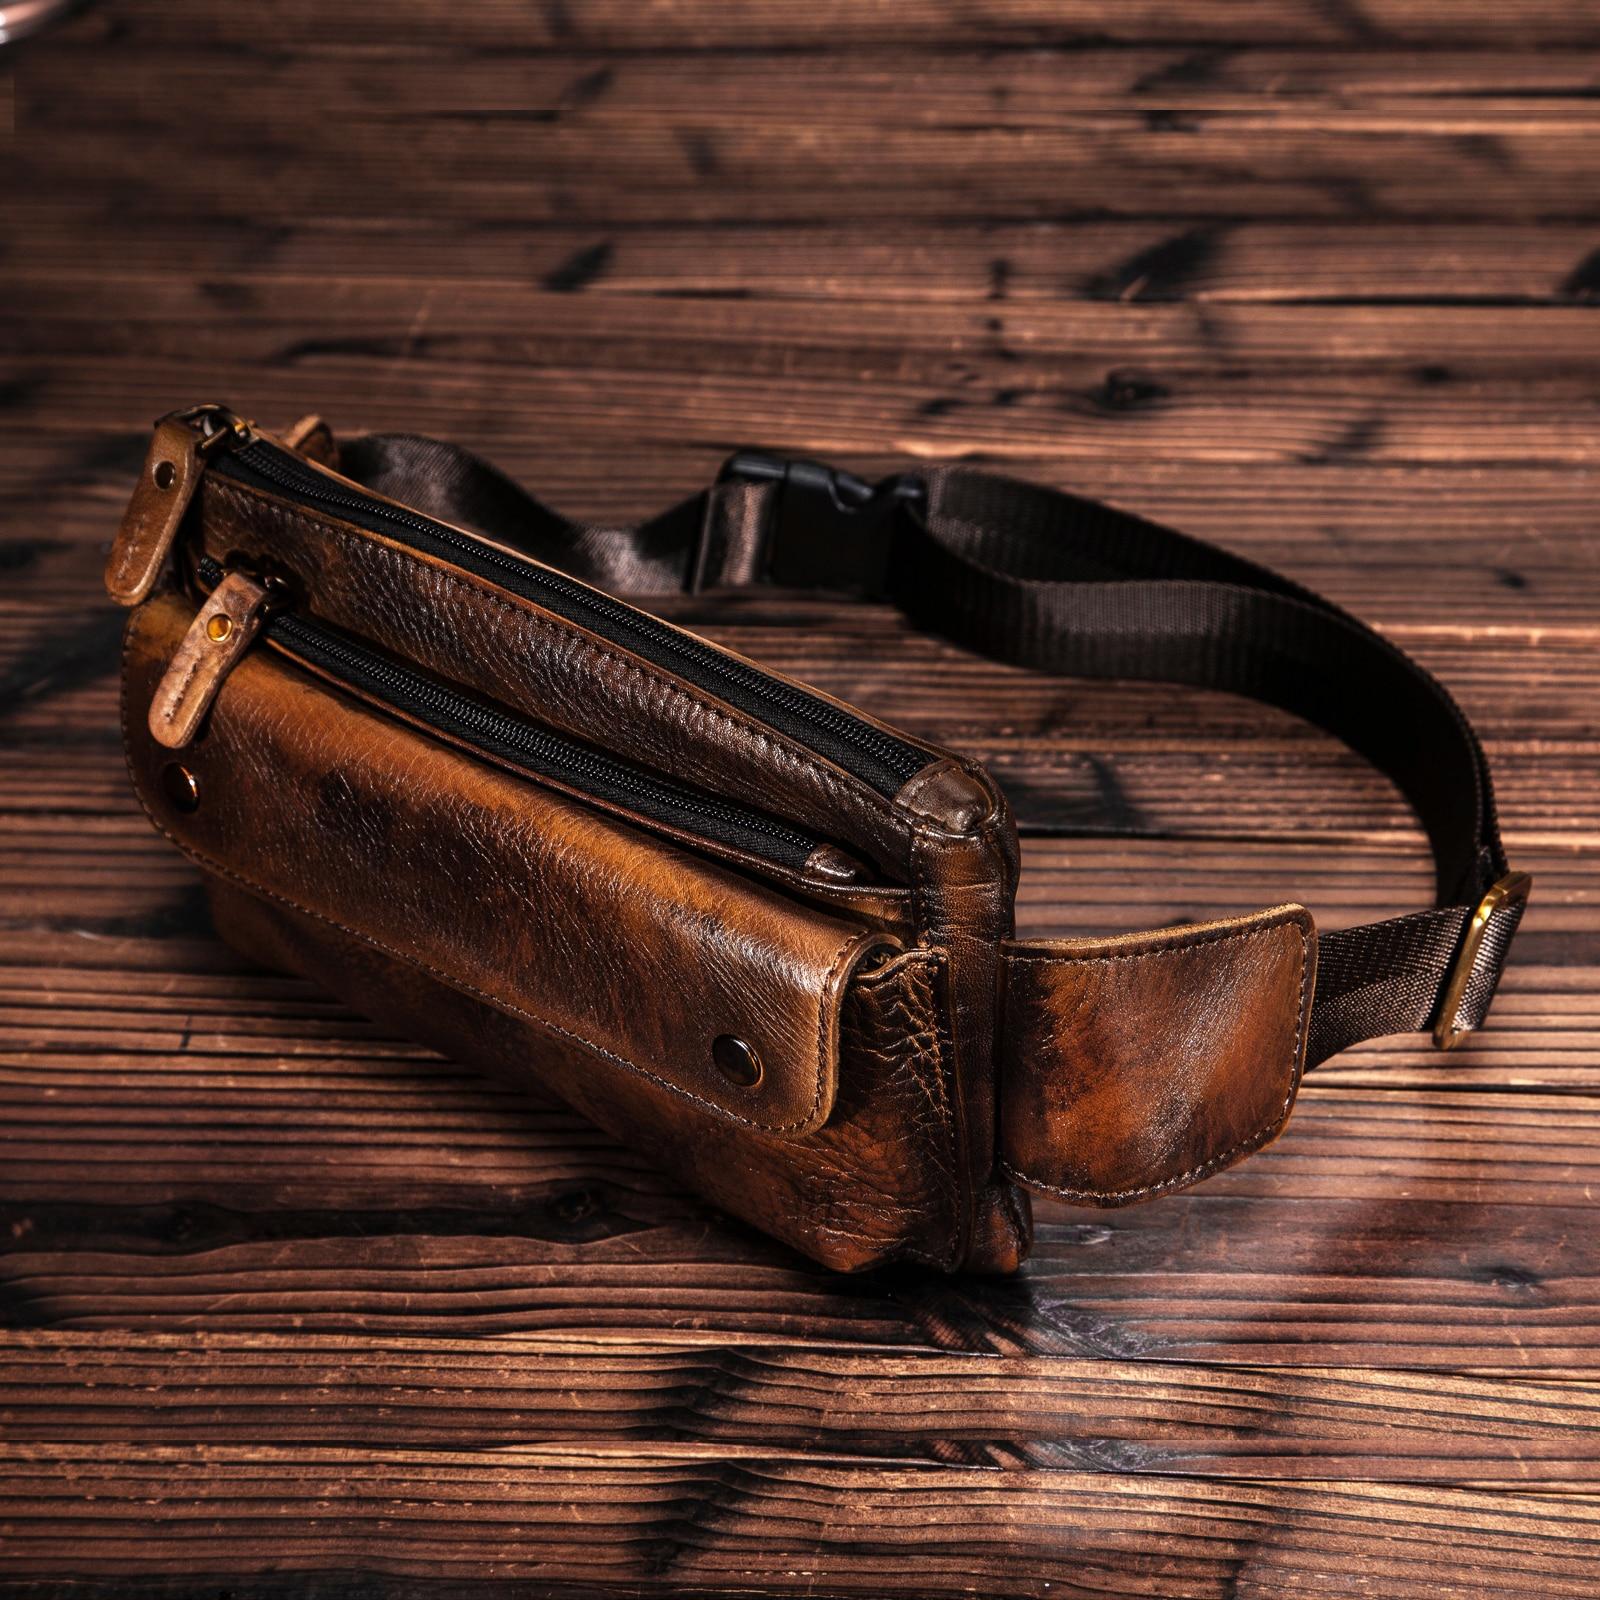 Cowhide Leather Men Casual Fashion Travel Fanny Waist Belt Bag Chest Sling Bag Design Bum 7